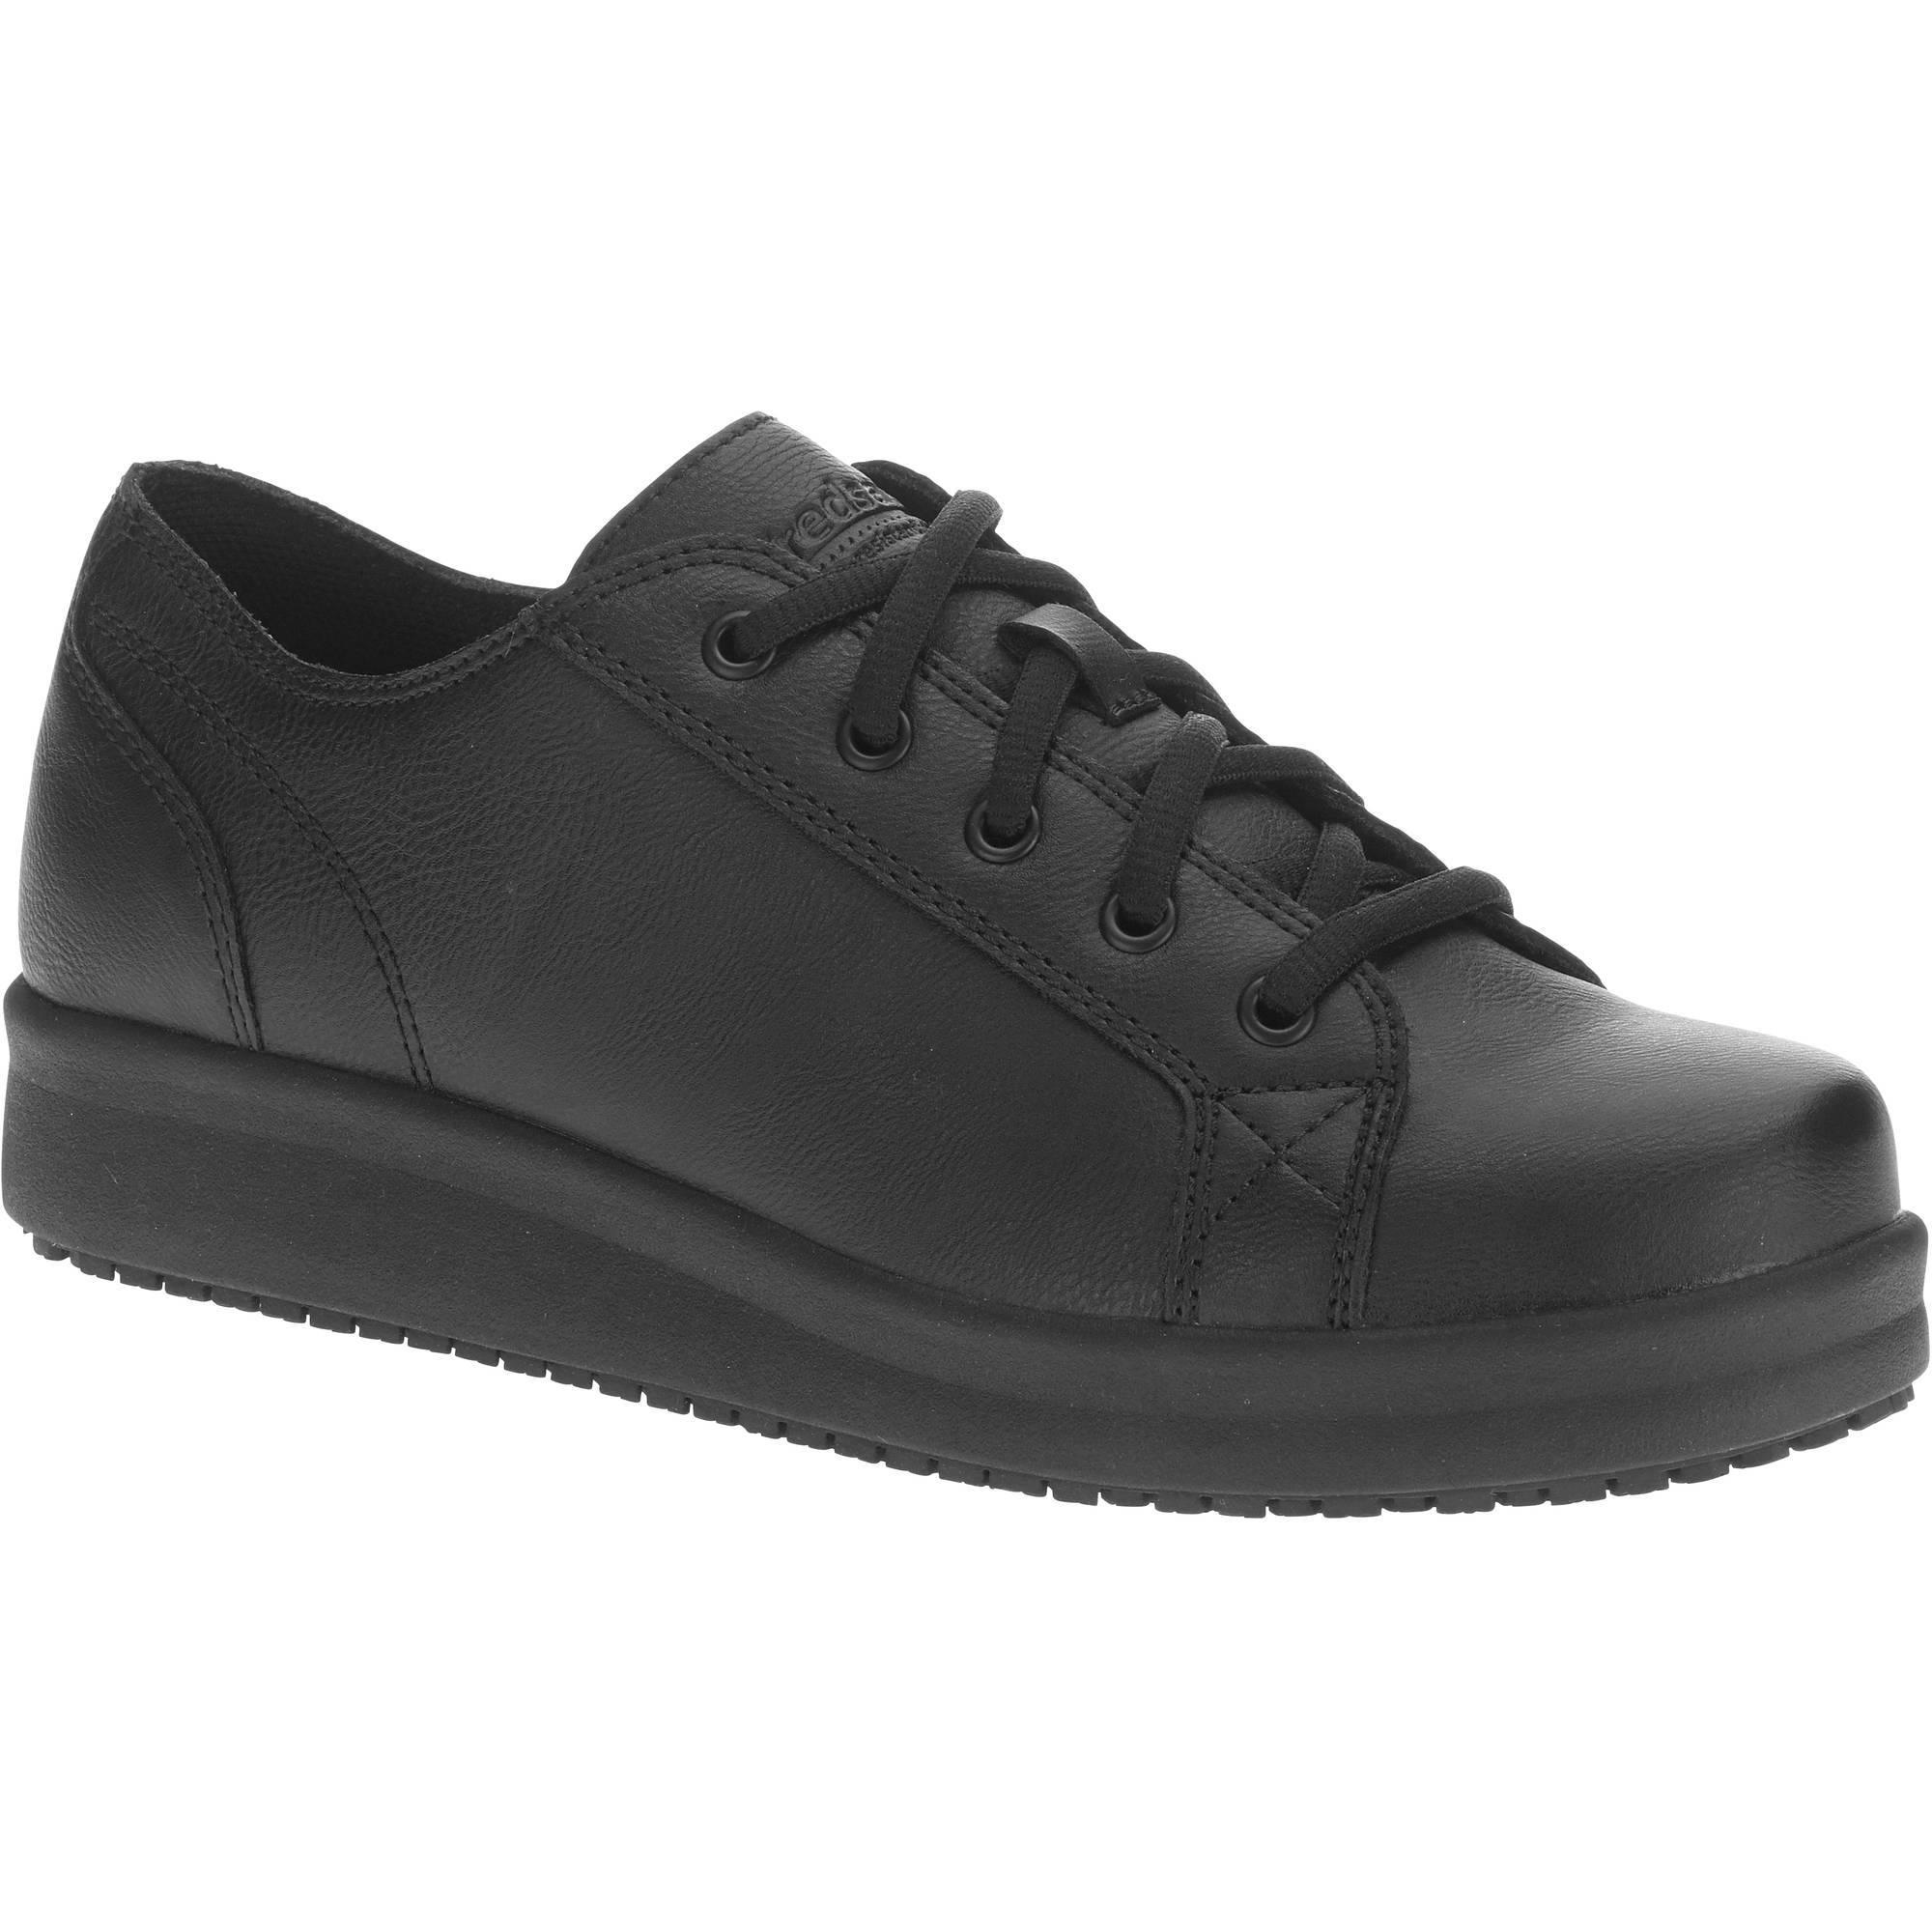 Tredsafe Womenu0026#39;s Iris Slip-Resistant Work Shoe - Walmart.com